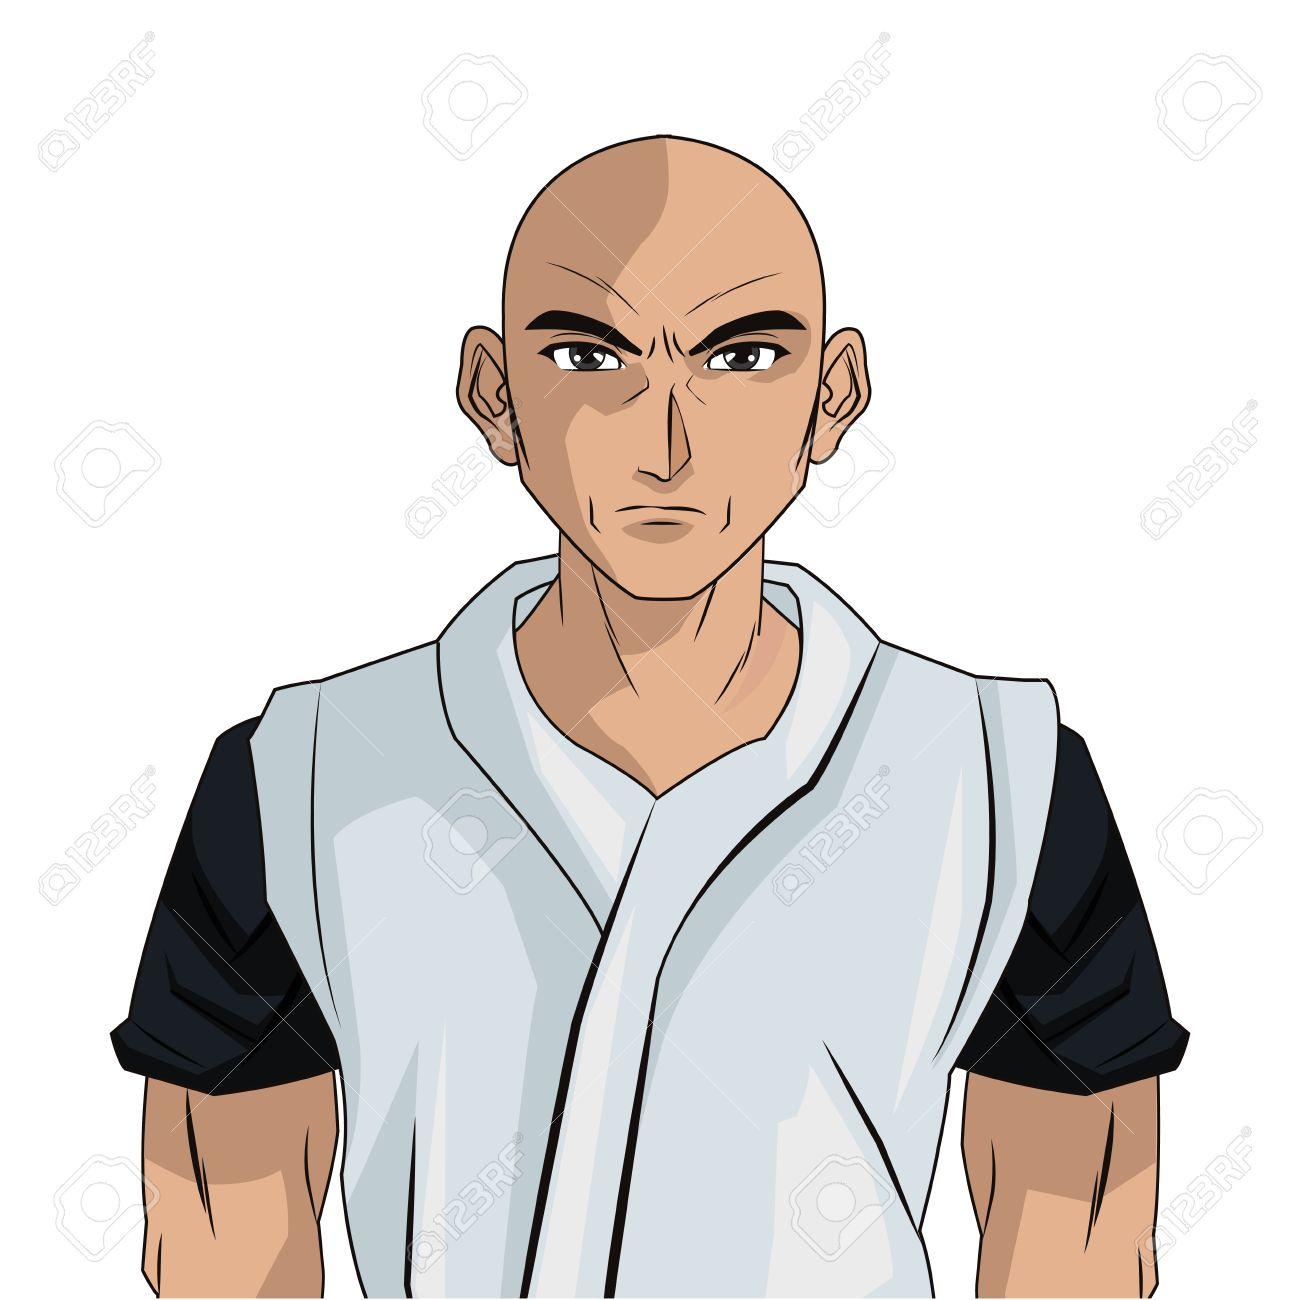 Homme Jeune Garcon Ne Anime Cheveux Manga Dessin Anime Comique Jeu